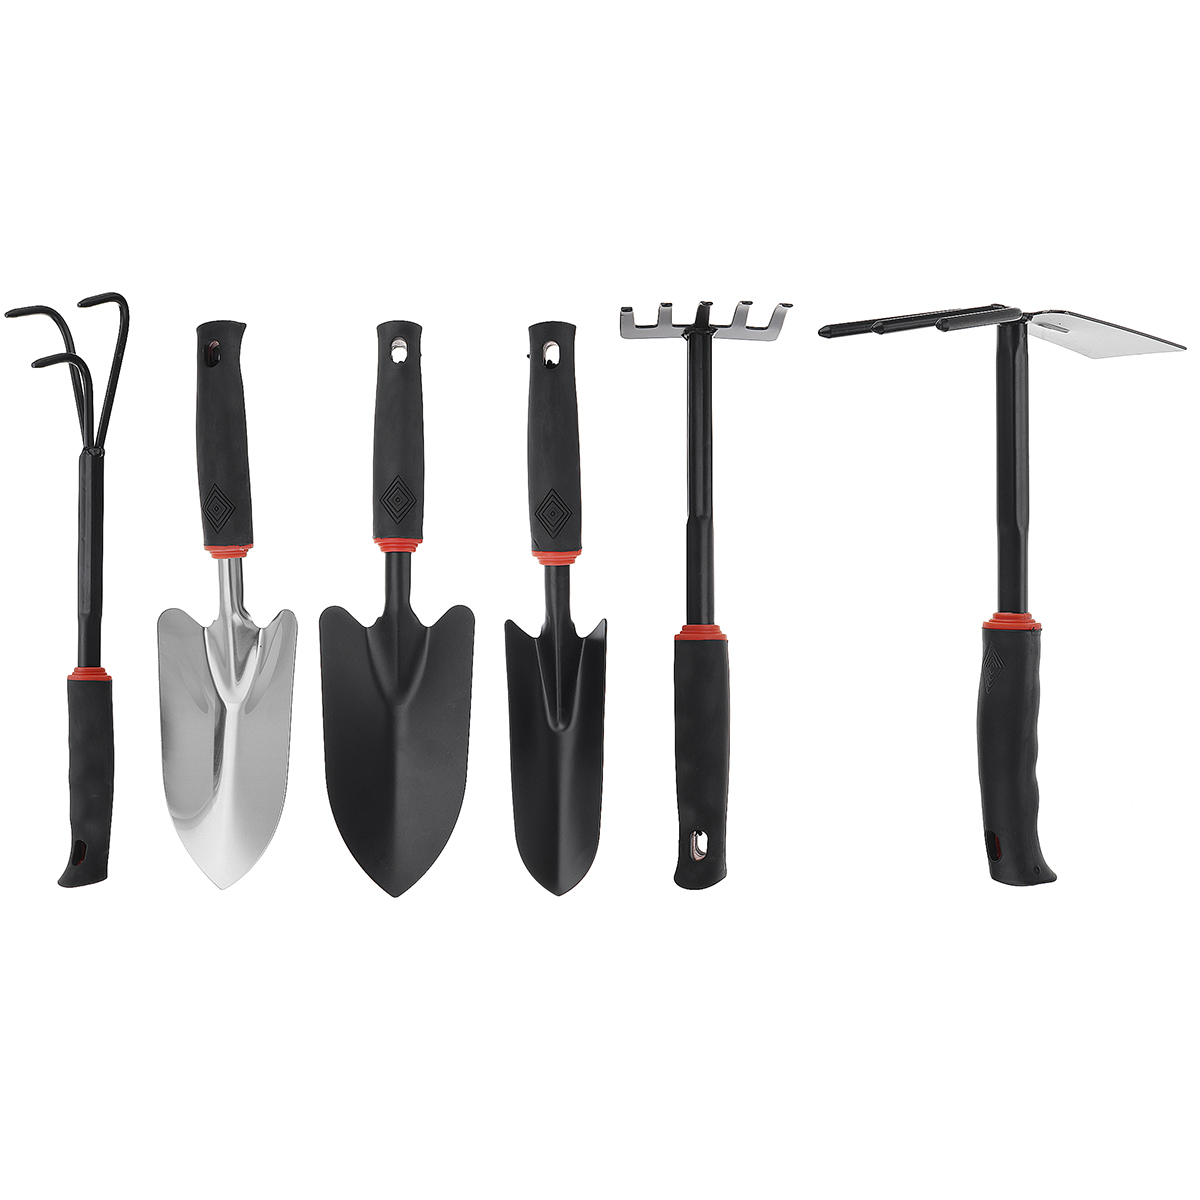 Durable Steel Hand Weeding Fork Transplanting Digging Tool Trowel Shovel Hoe 3/5 Pronged Rake For Garden Planting Hand Tool